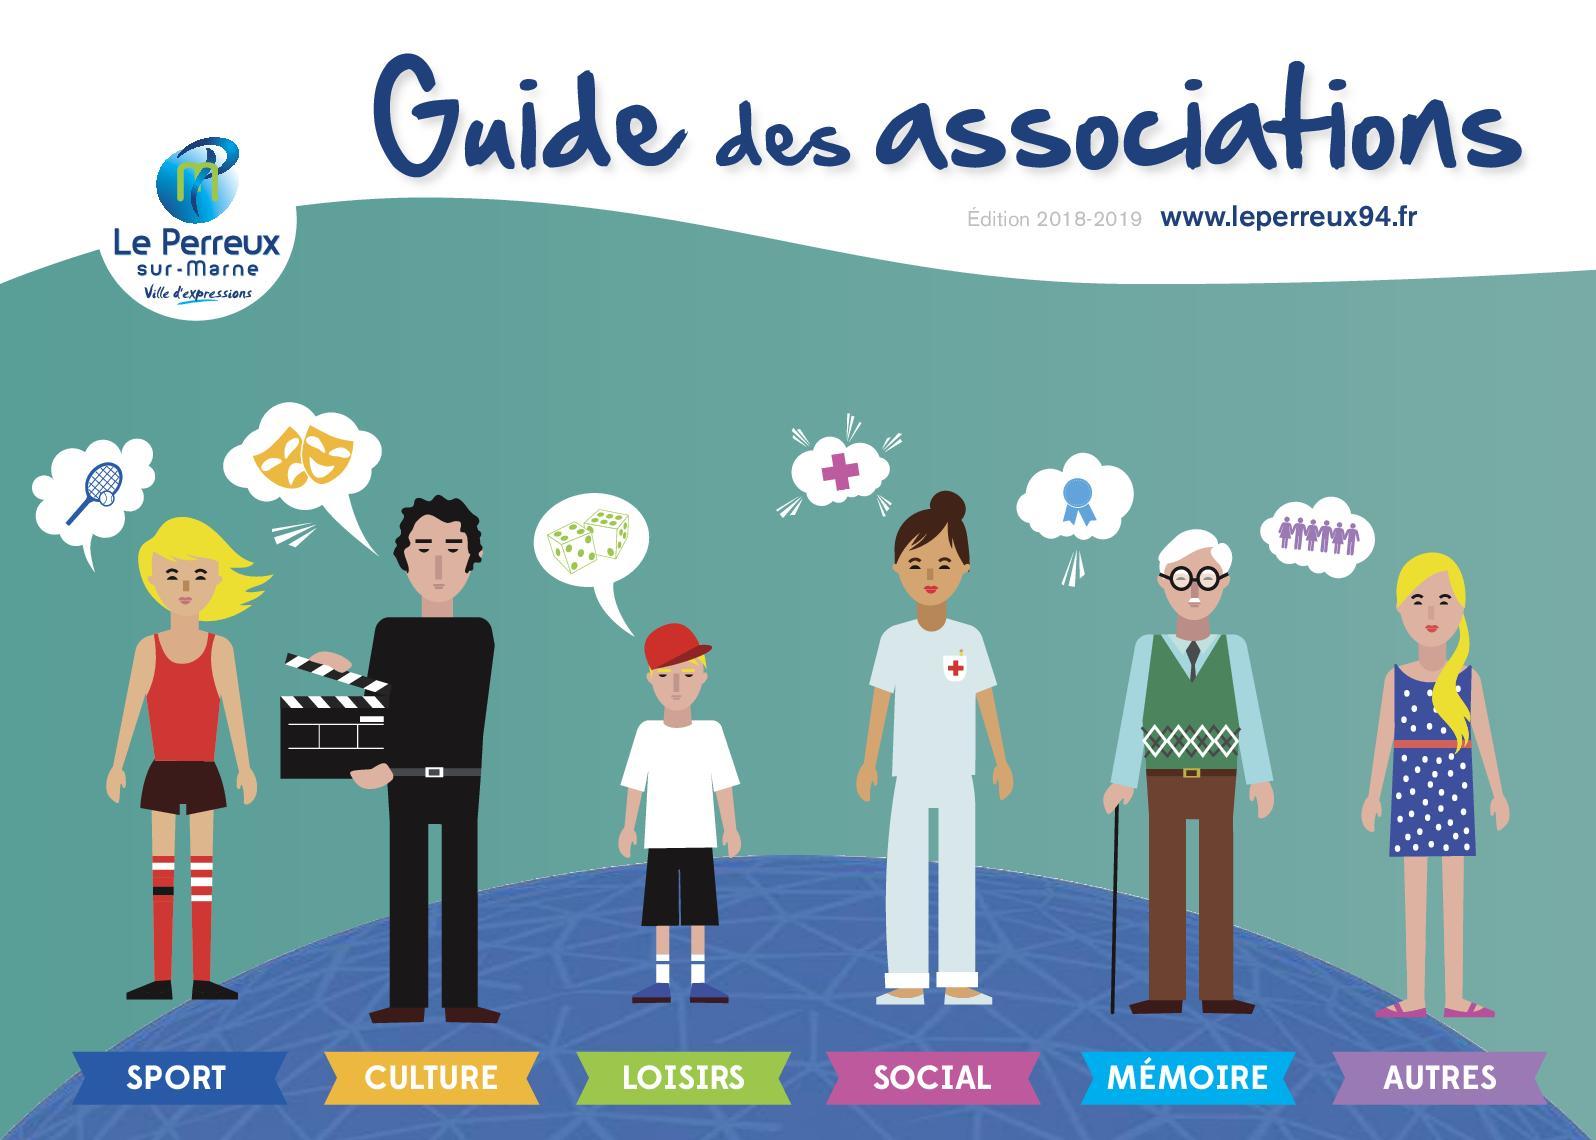 Calaméo - Guide des Associations 2018 fc4c00ad9df